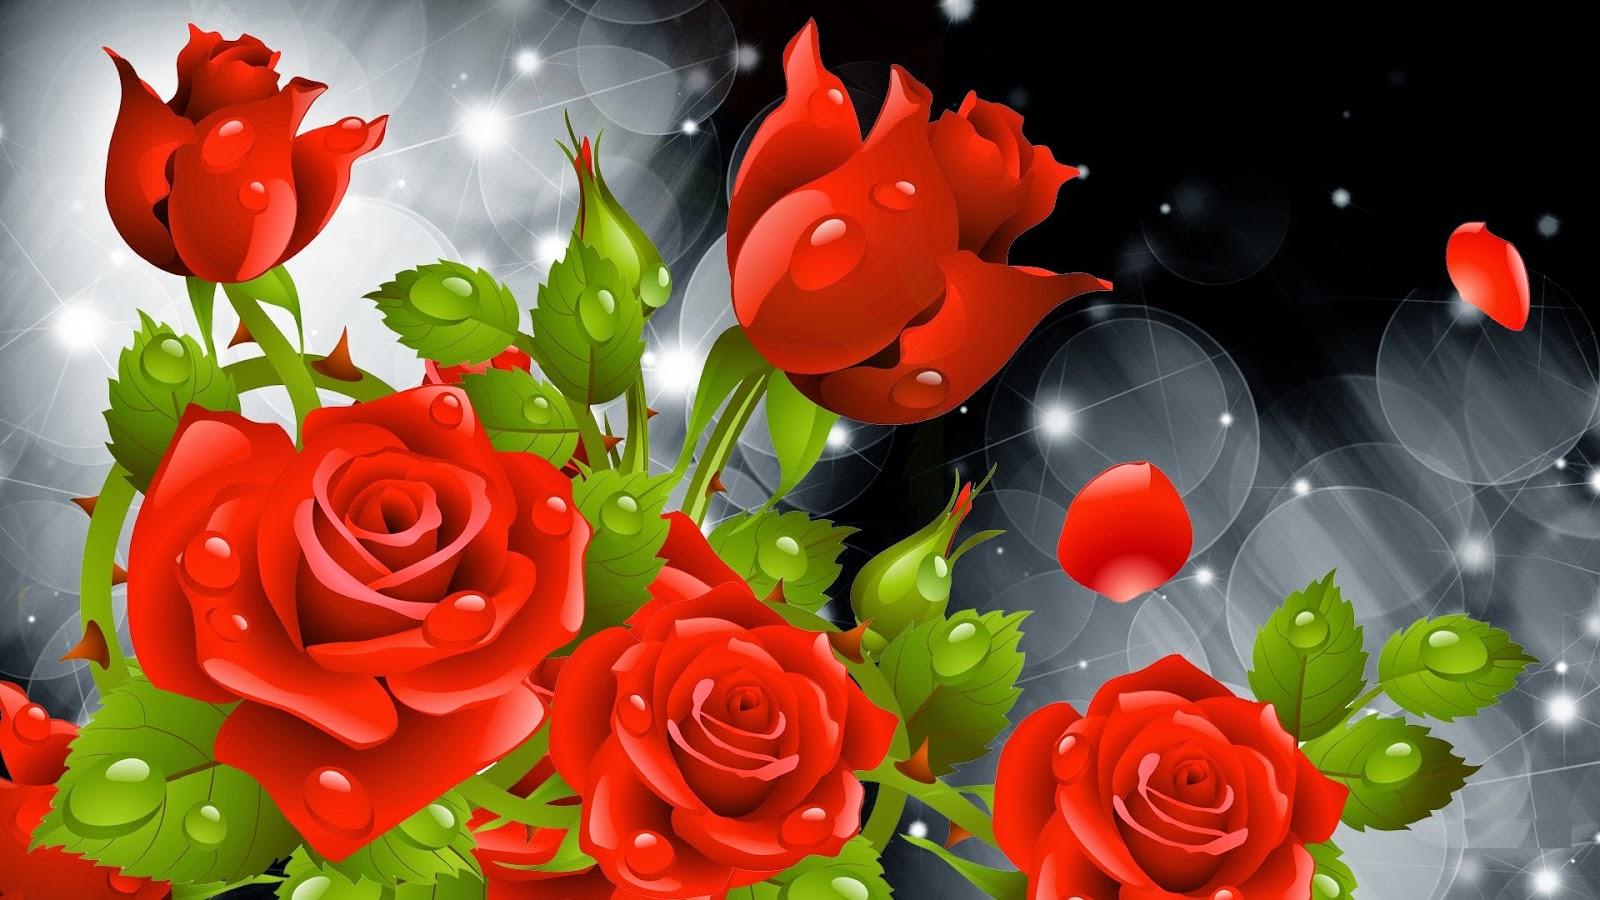 rose hd wallpaper free download